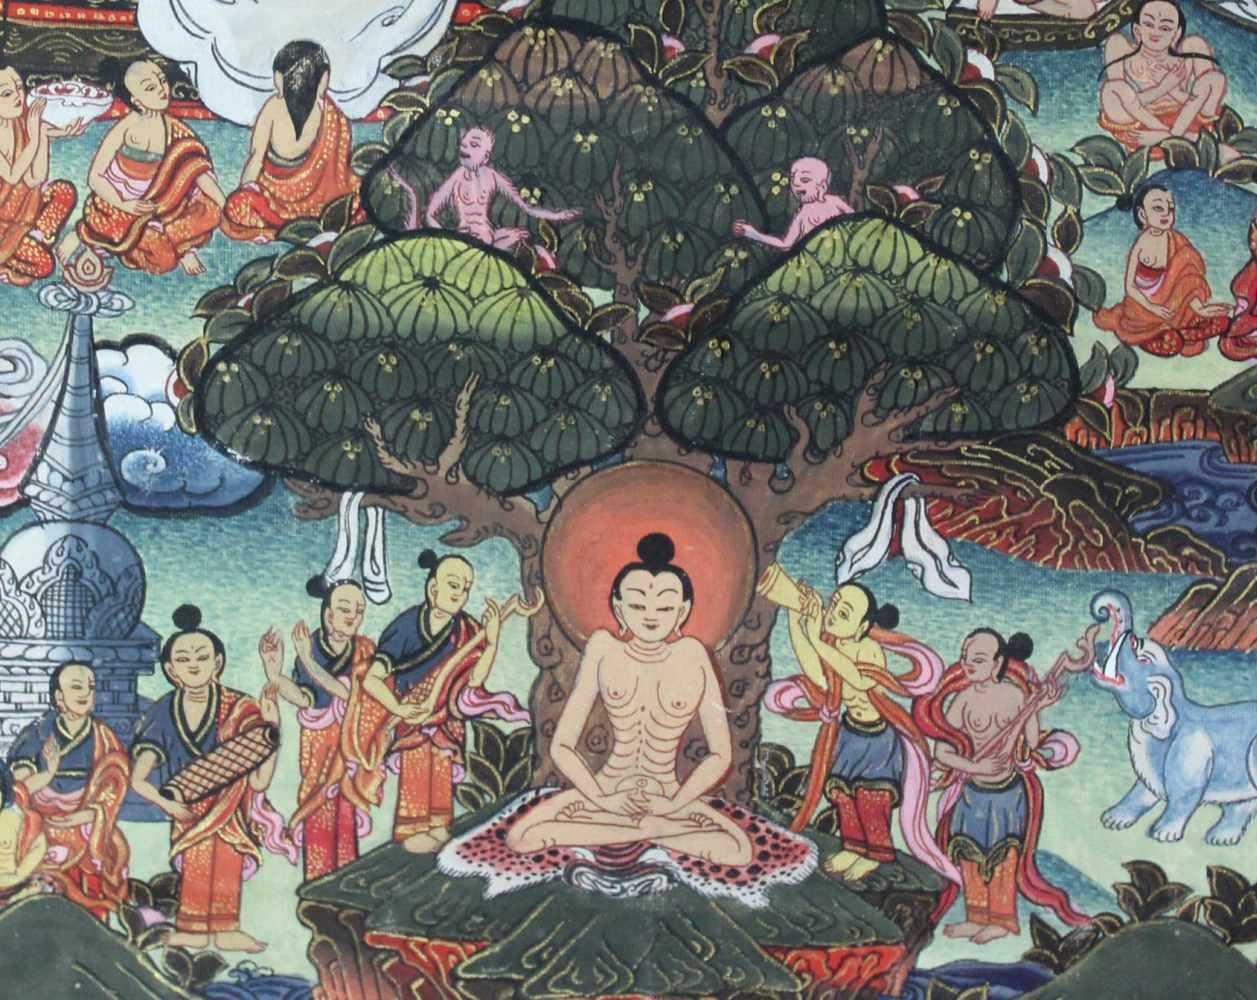 Lot 28 - Buddha Thangka, wohl Darstellung des Guru Sakyasimha. China / Tibet alt.75 cm x 50 cm. Gemälde.